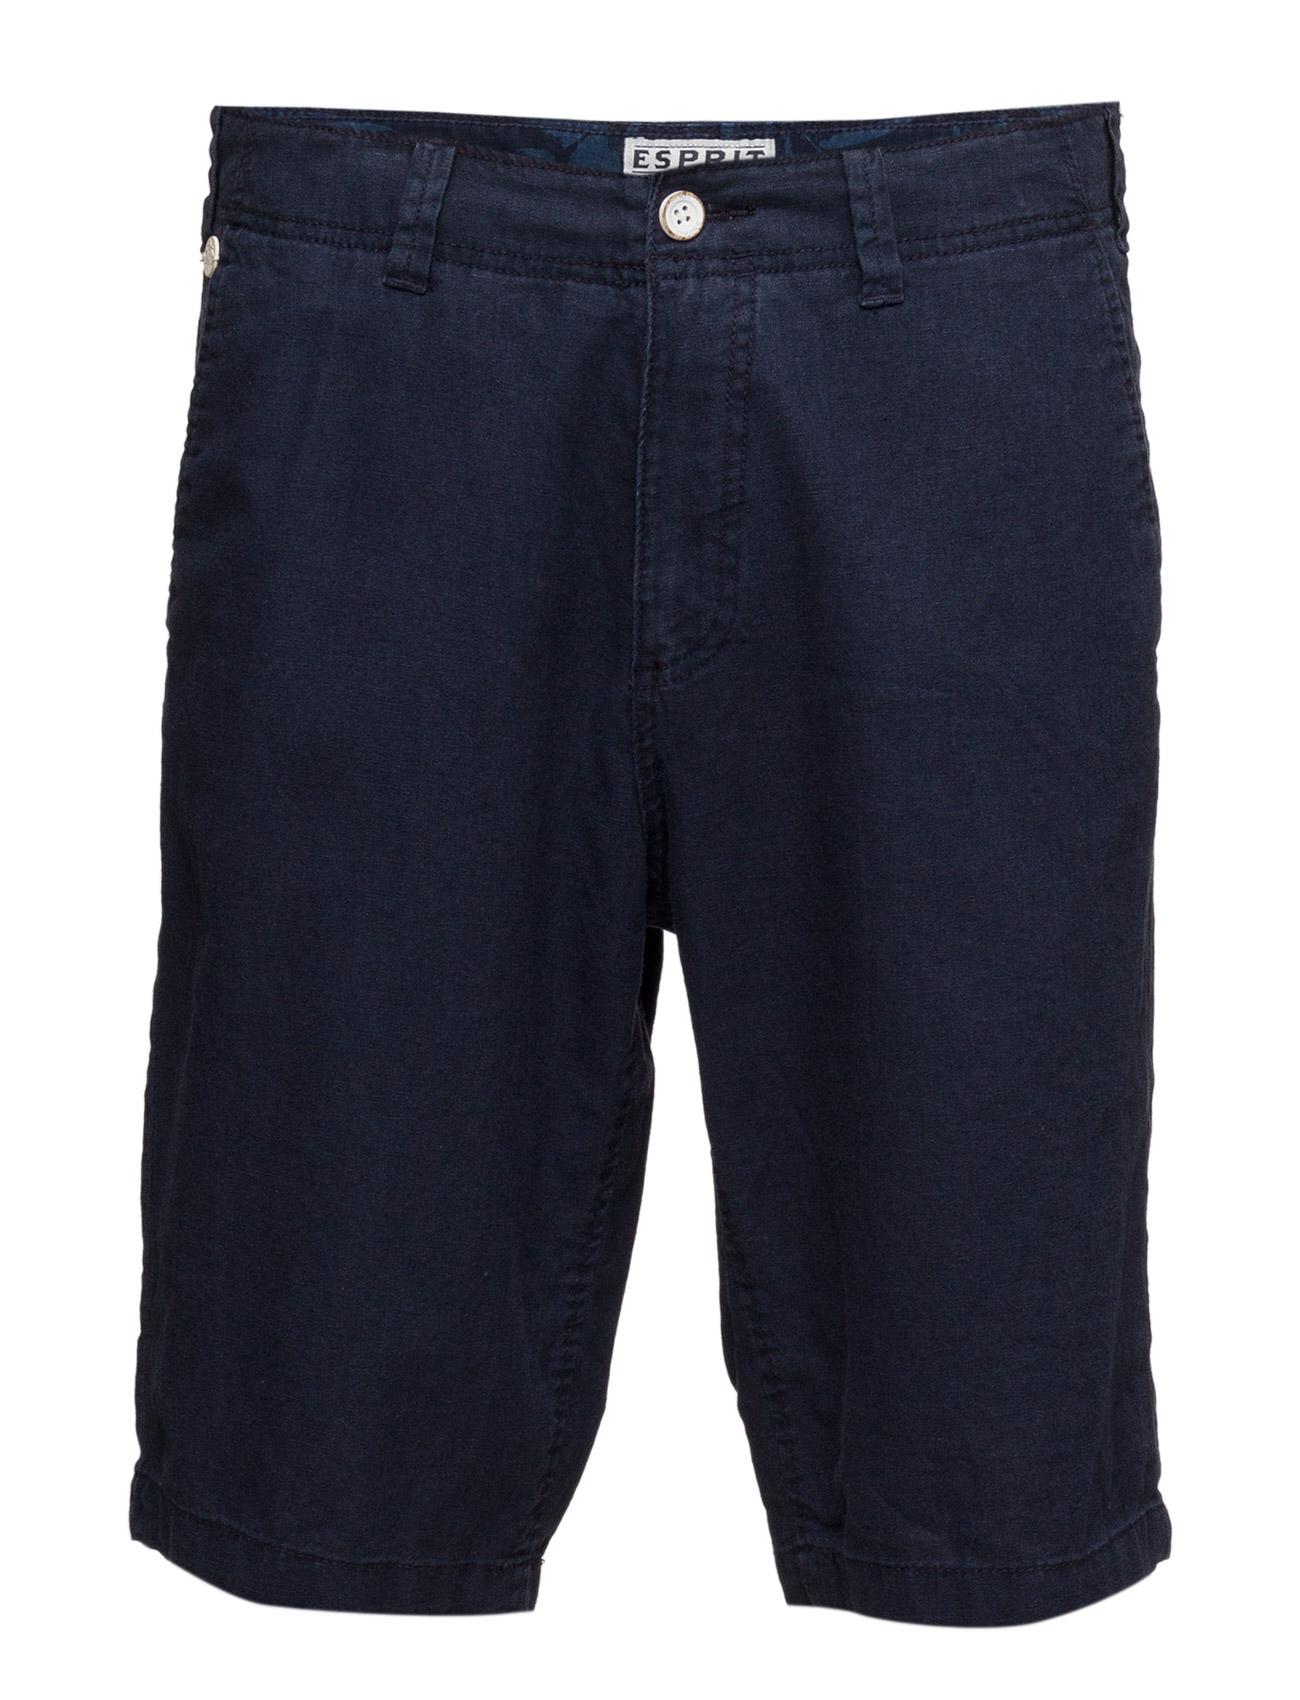 Shorts Woven Esprit Casual Bermuda shorts til Mænd i